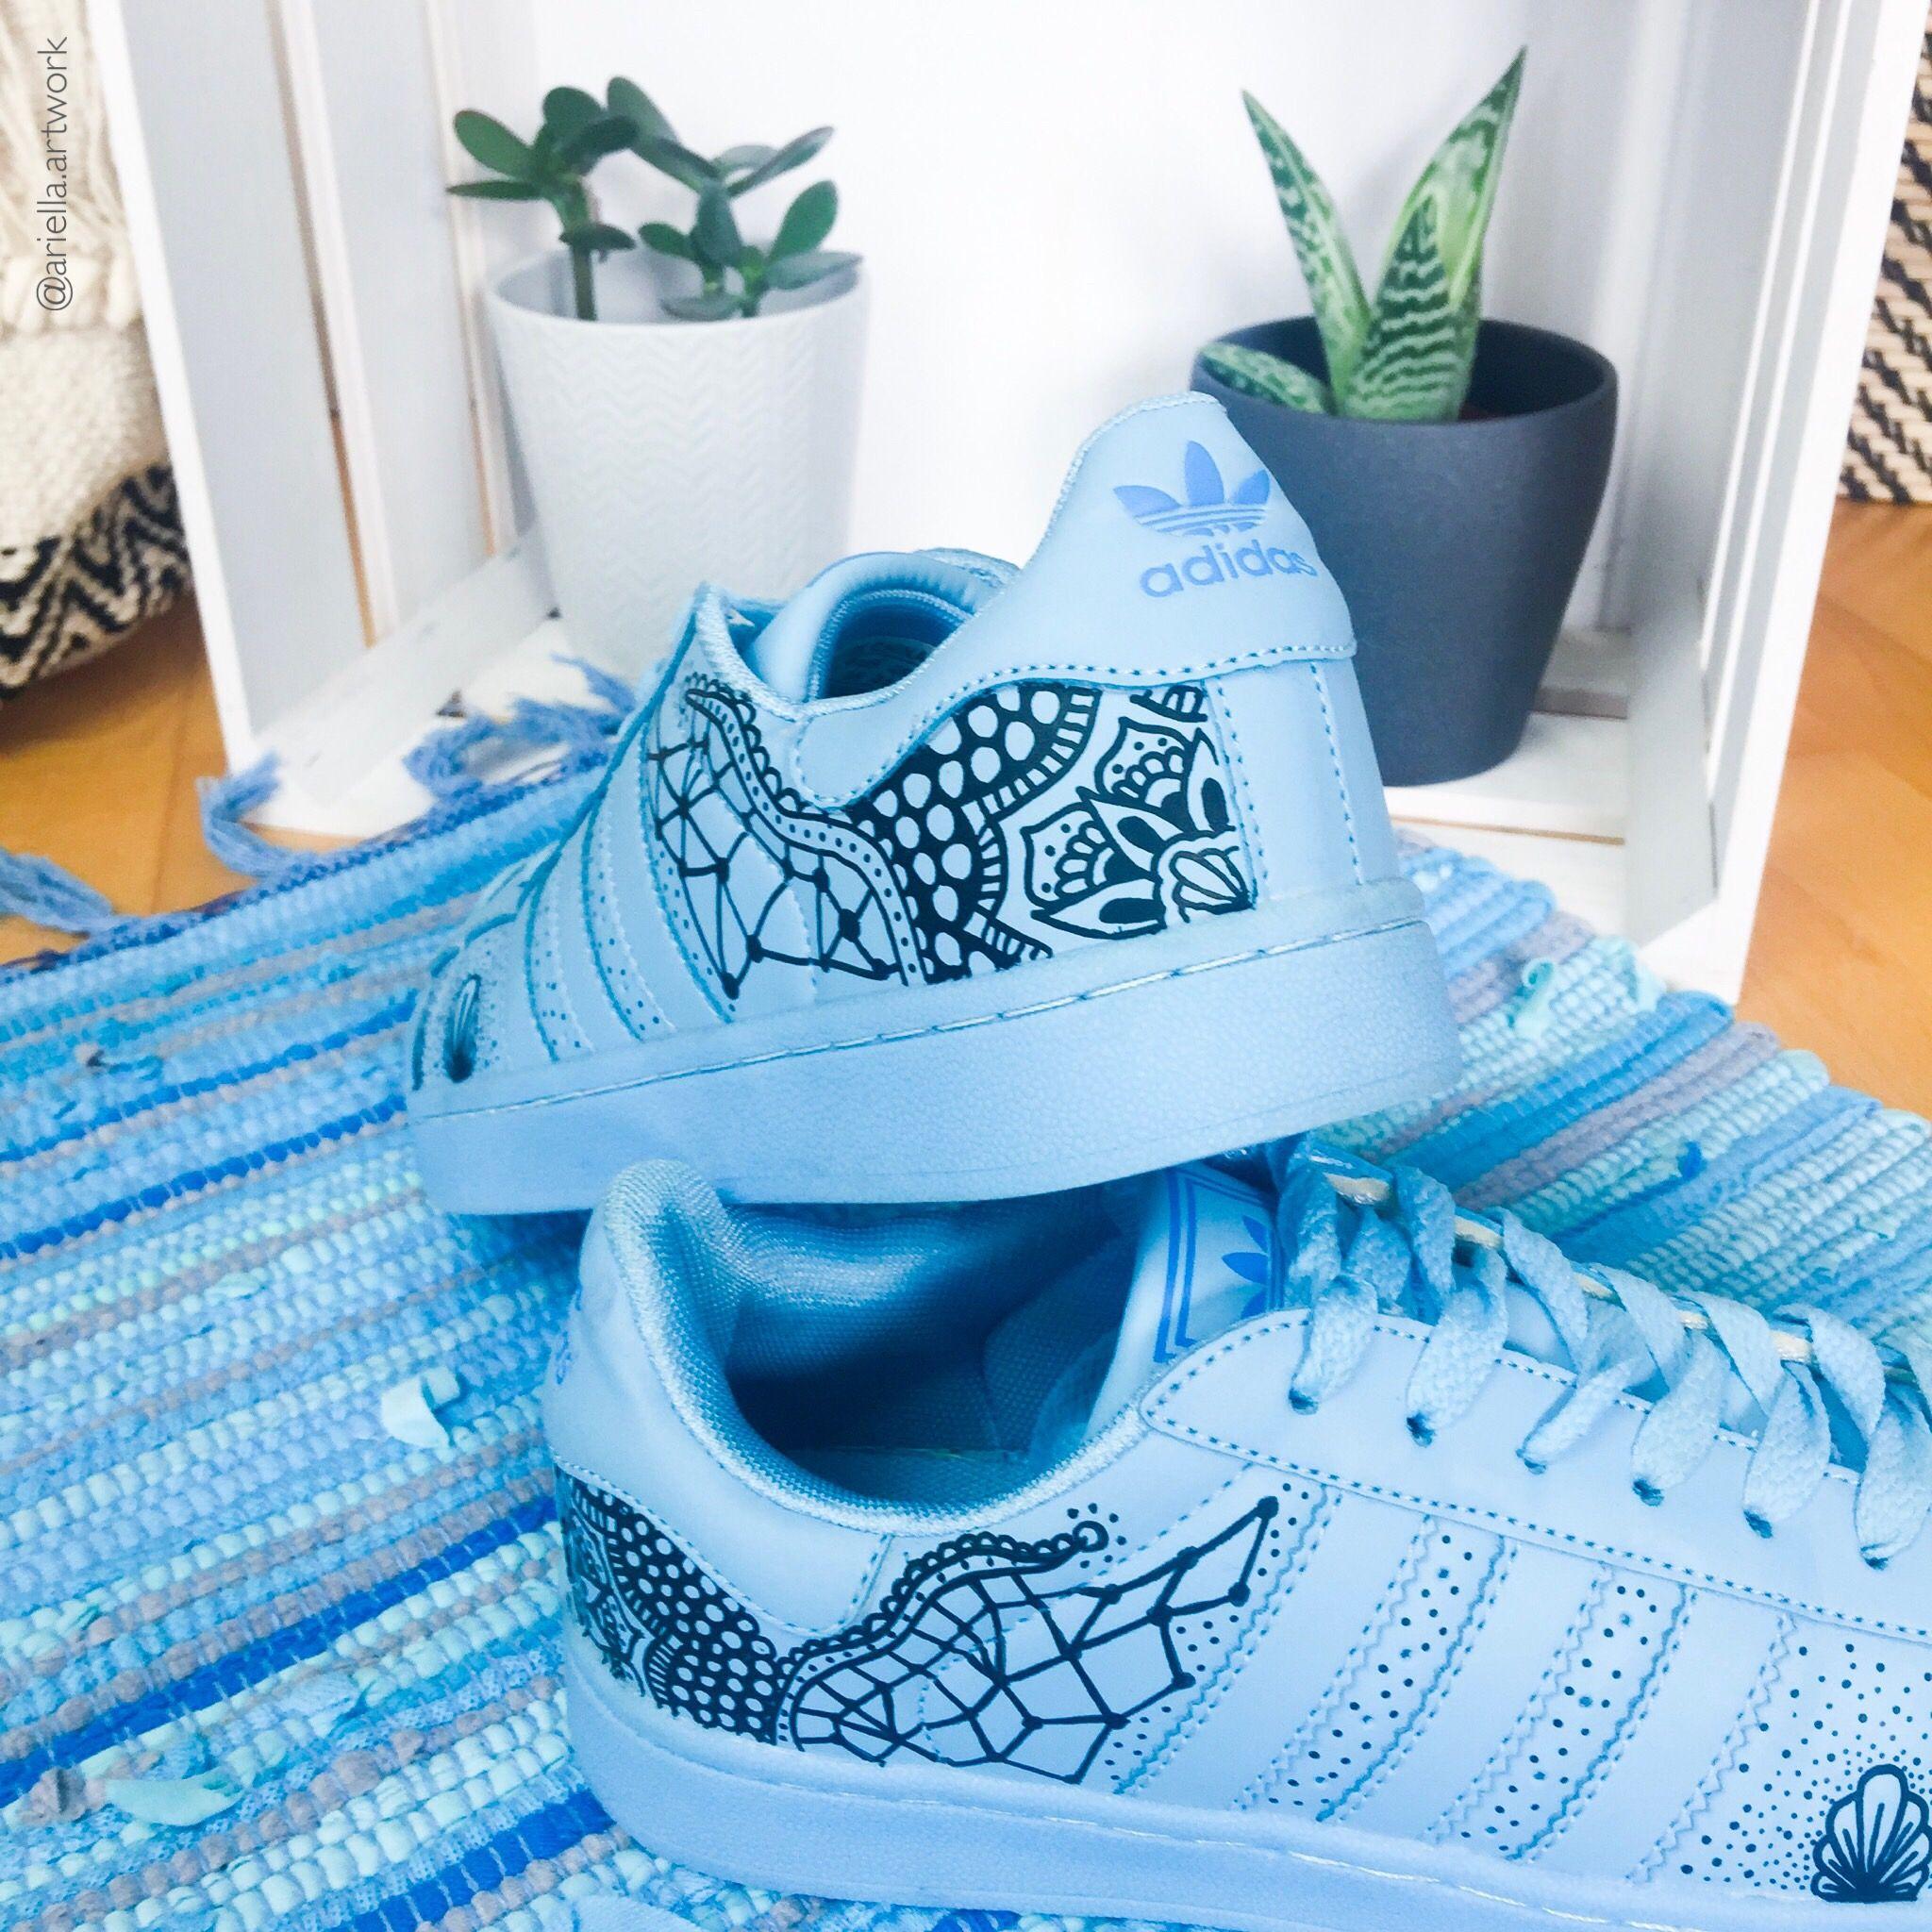 adidas schuhe selber designen online